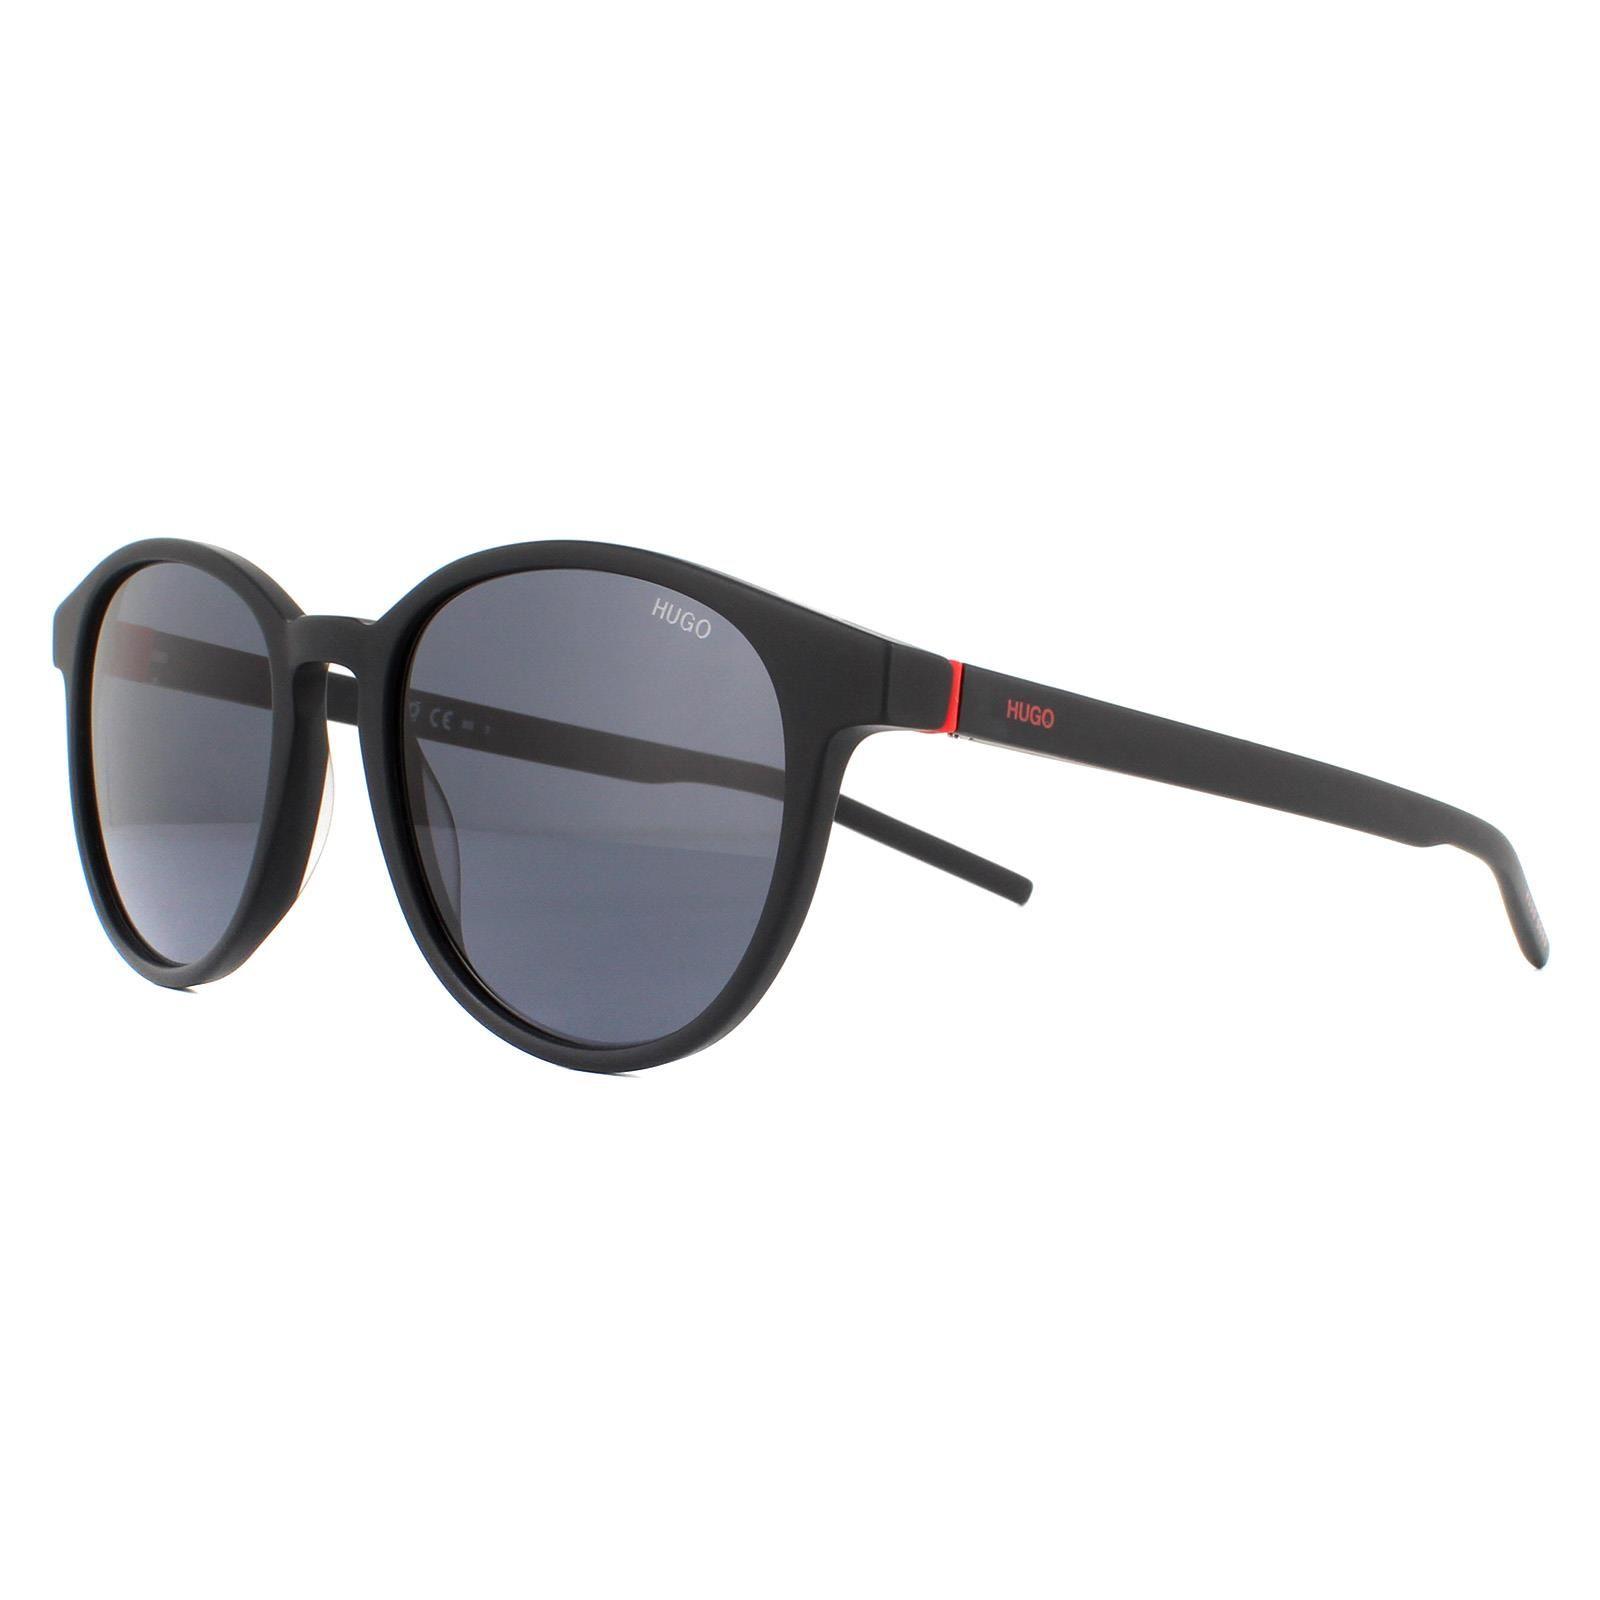 Hugo by Hugo Boss Sunglasses HG1127/S 003/IR Matte Black Grey